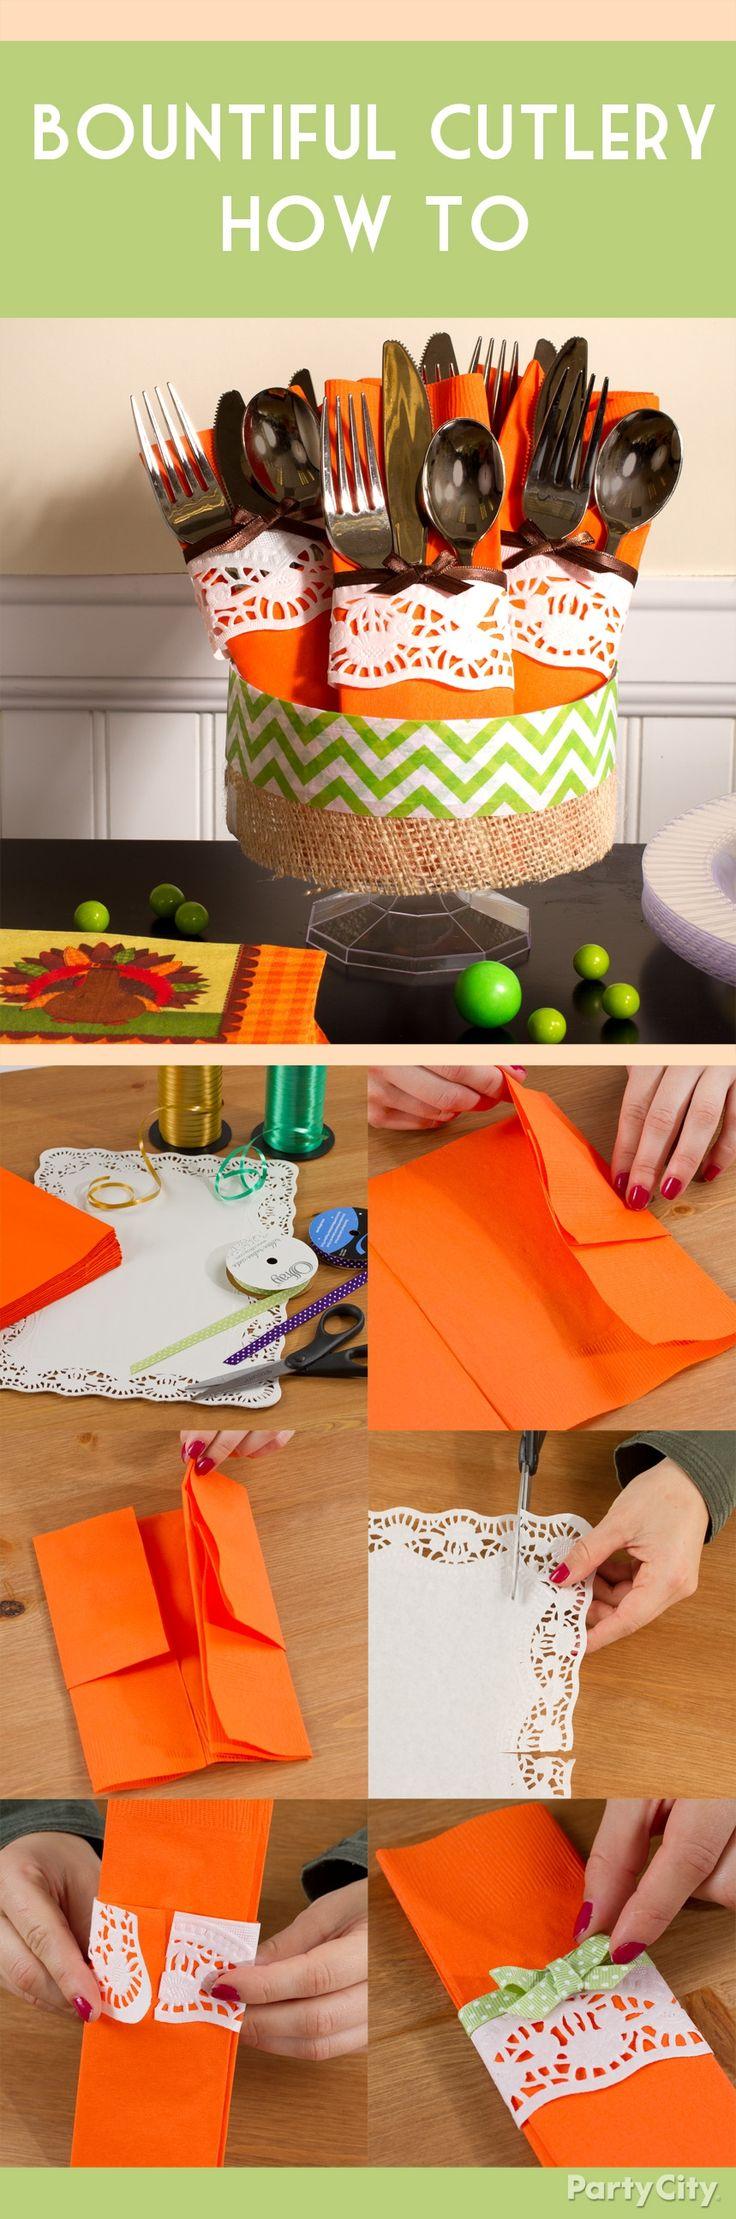 25+ Best Ideas about Easy Napkin Folding on Pinterest ...